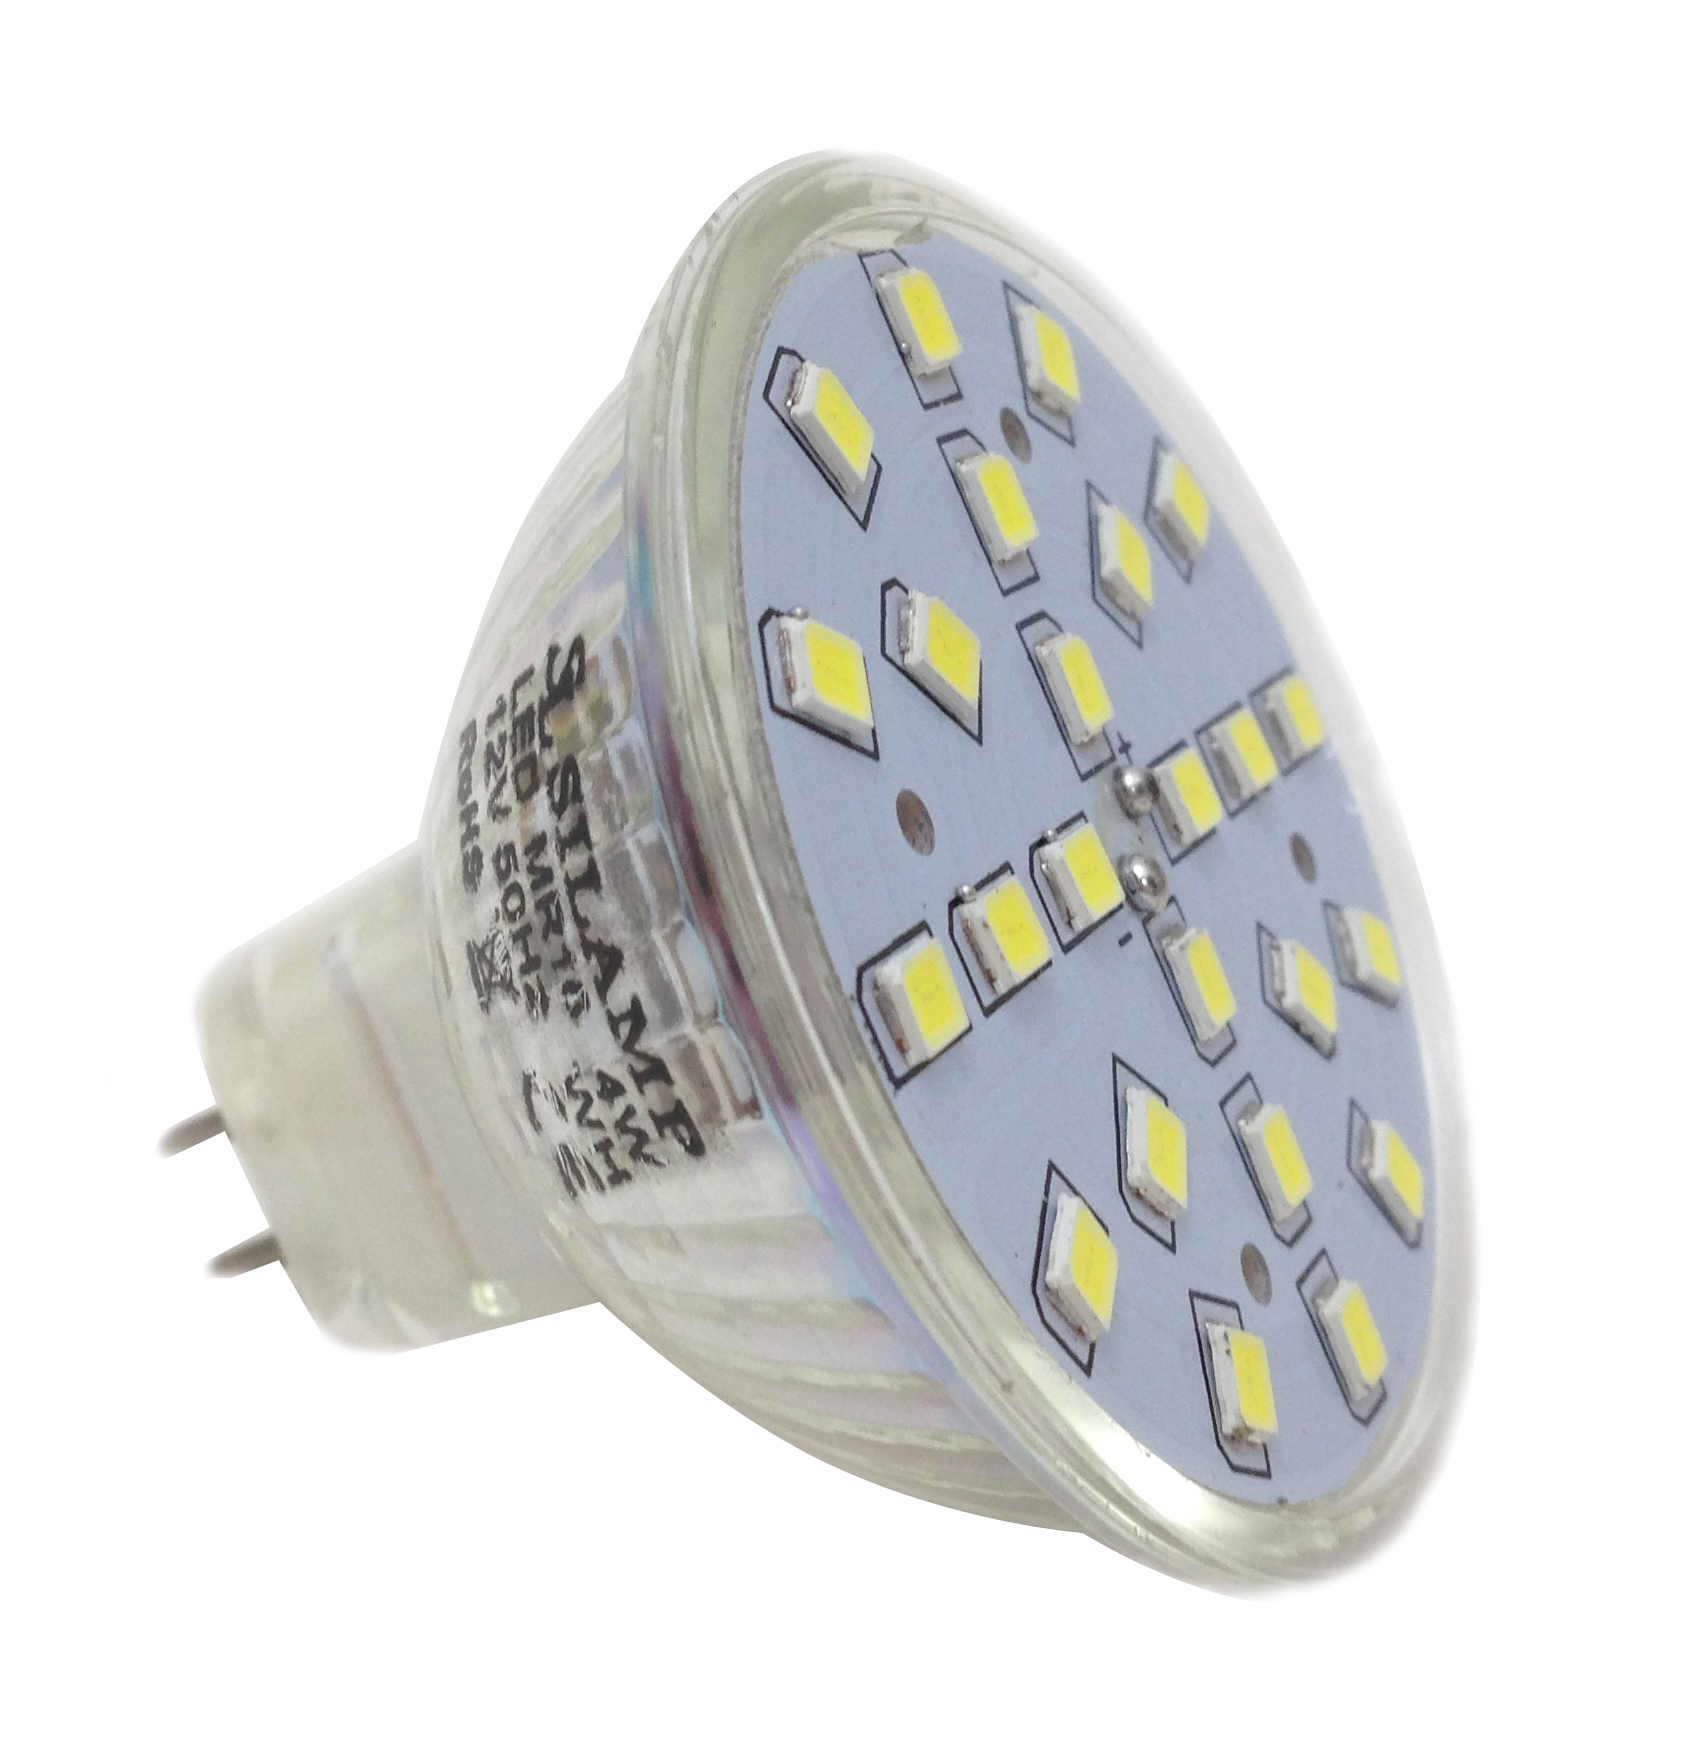 Mr16 4w 2835smd offerte lampadine led silamp for Offerte lampadine led